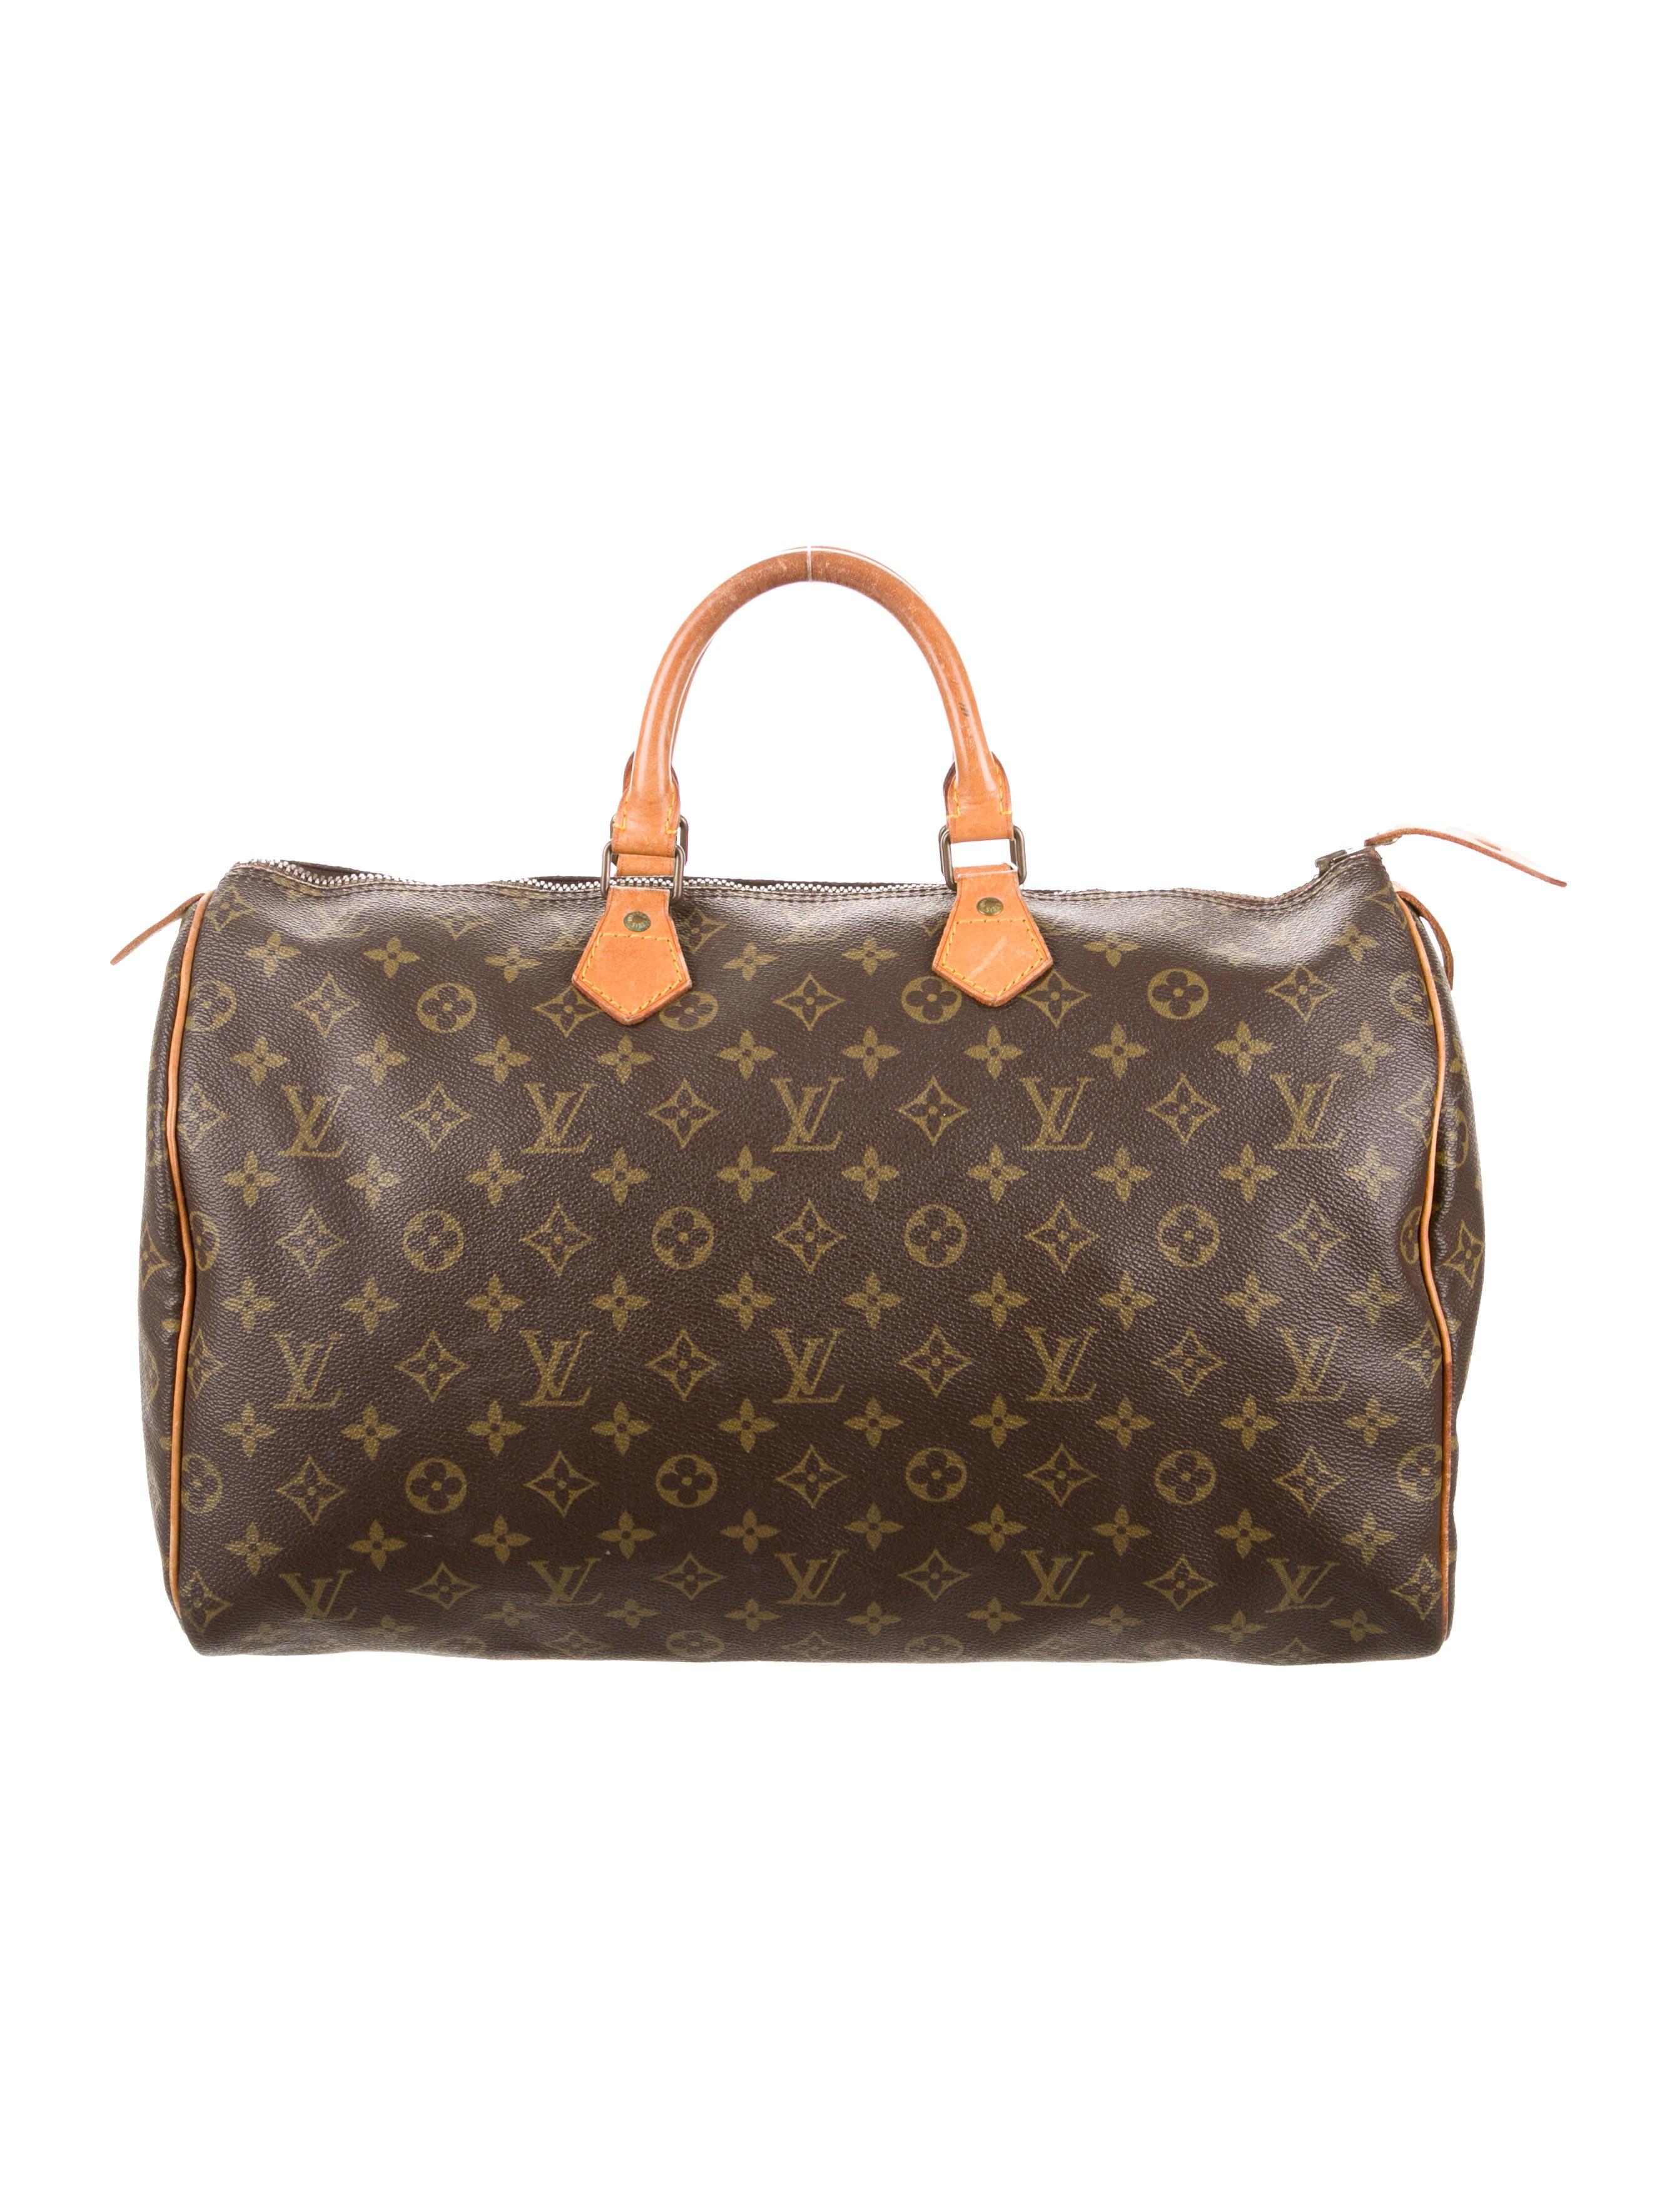 louis vuitton monogram speedy 40 handbags lou107163. Black Bedroom Furniture Sets. Home Design Ideas